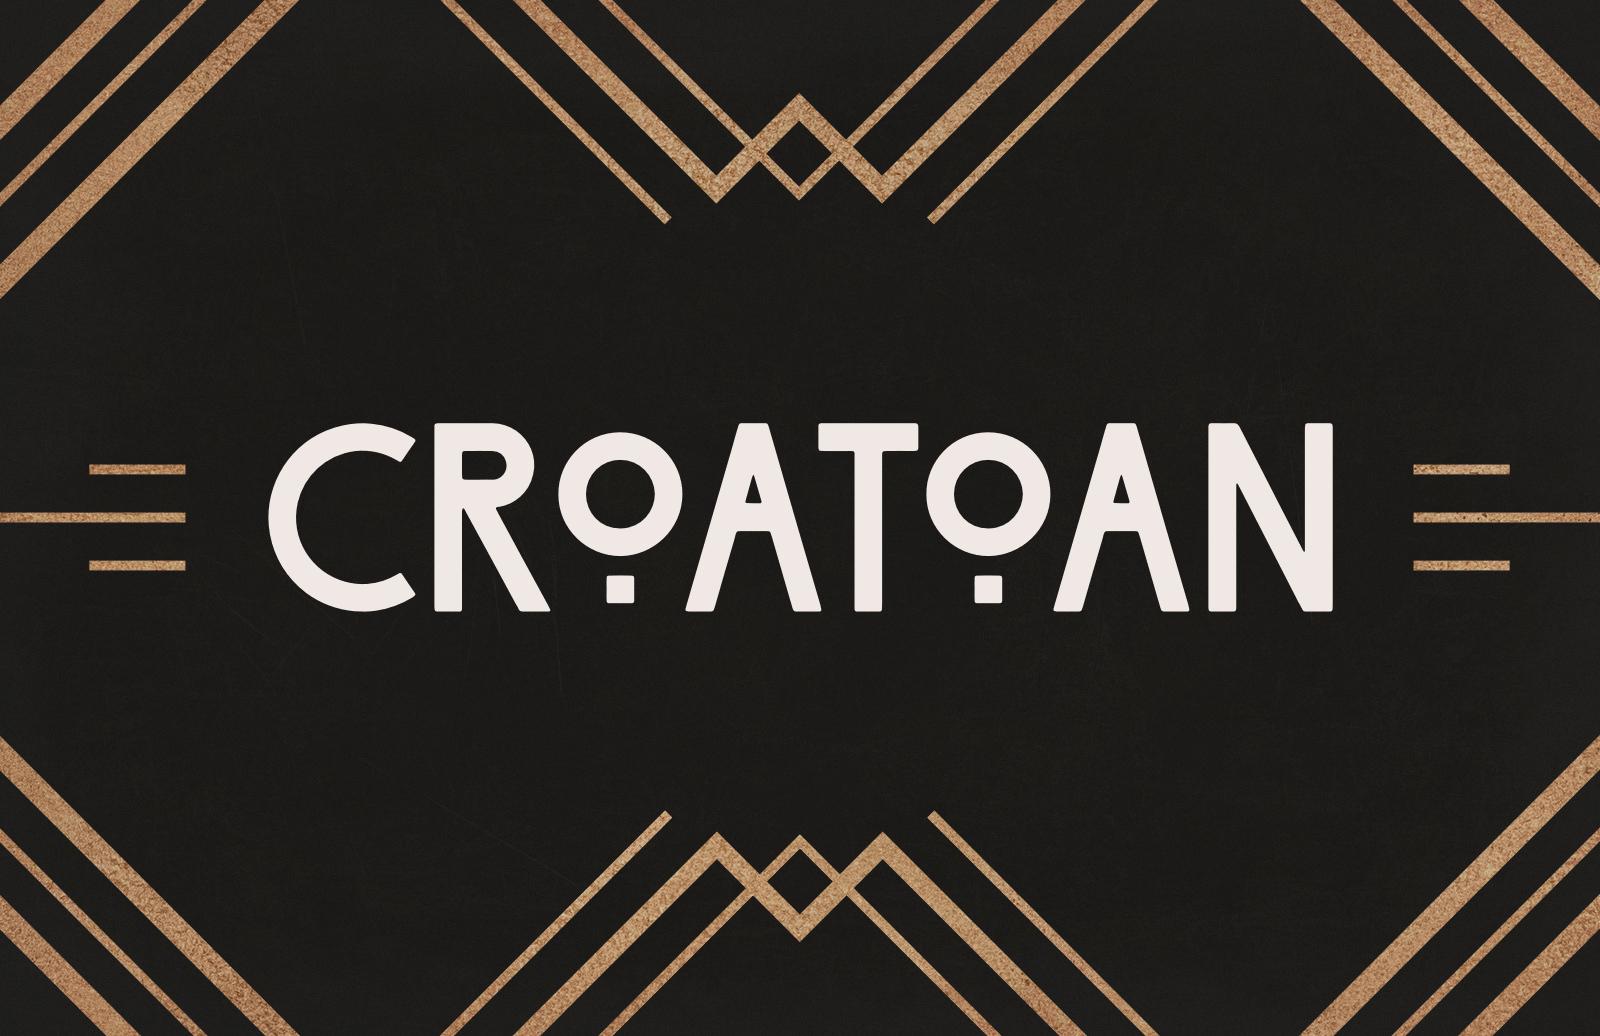 Croatoan Font Preview 1